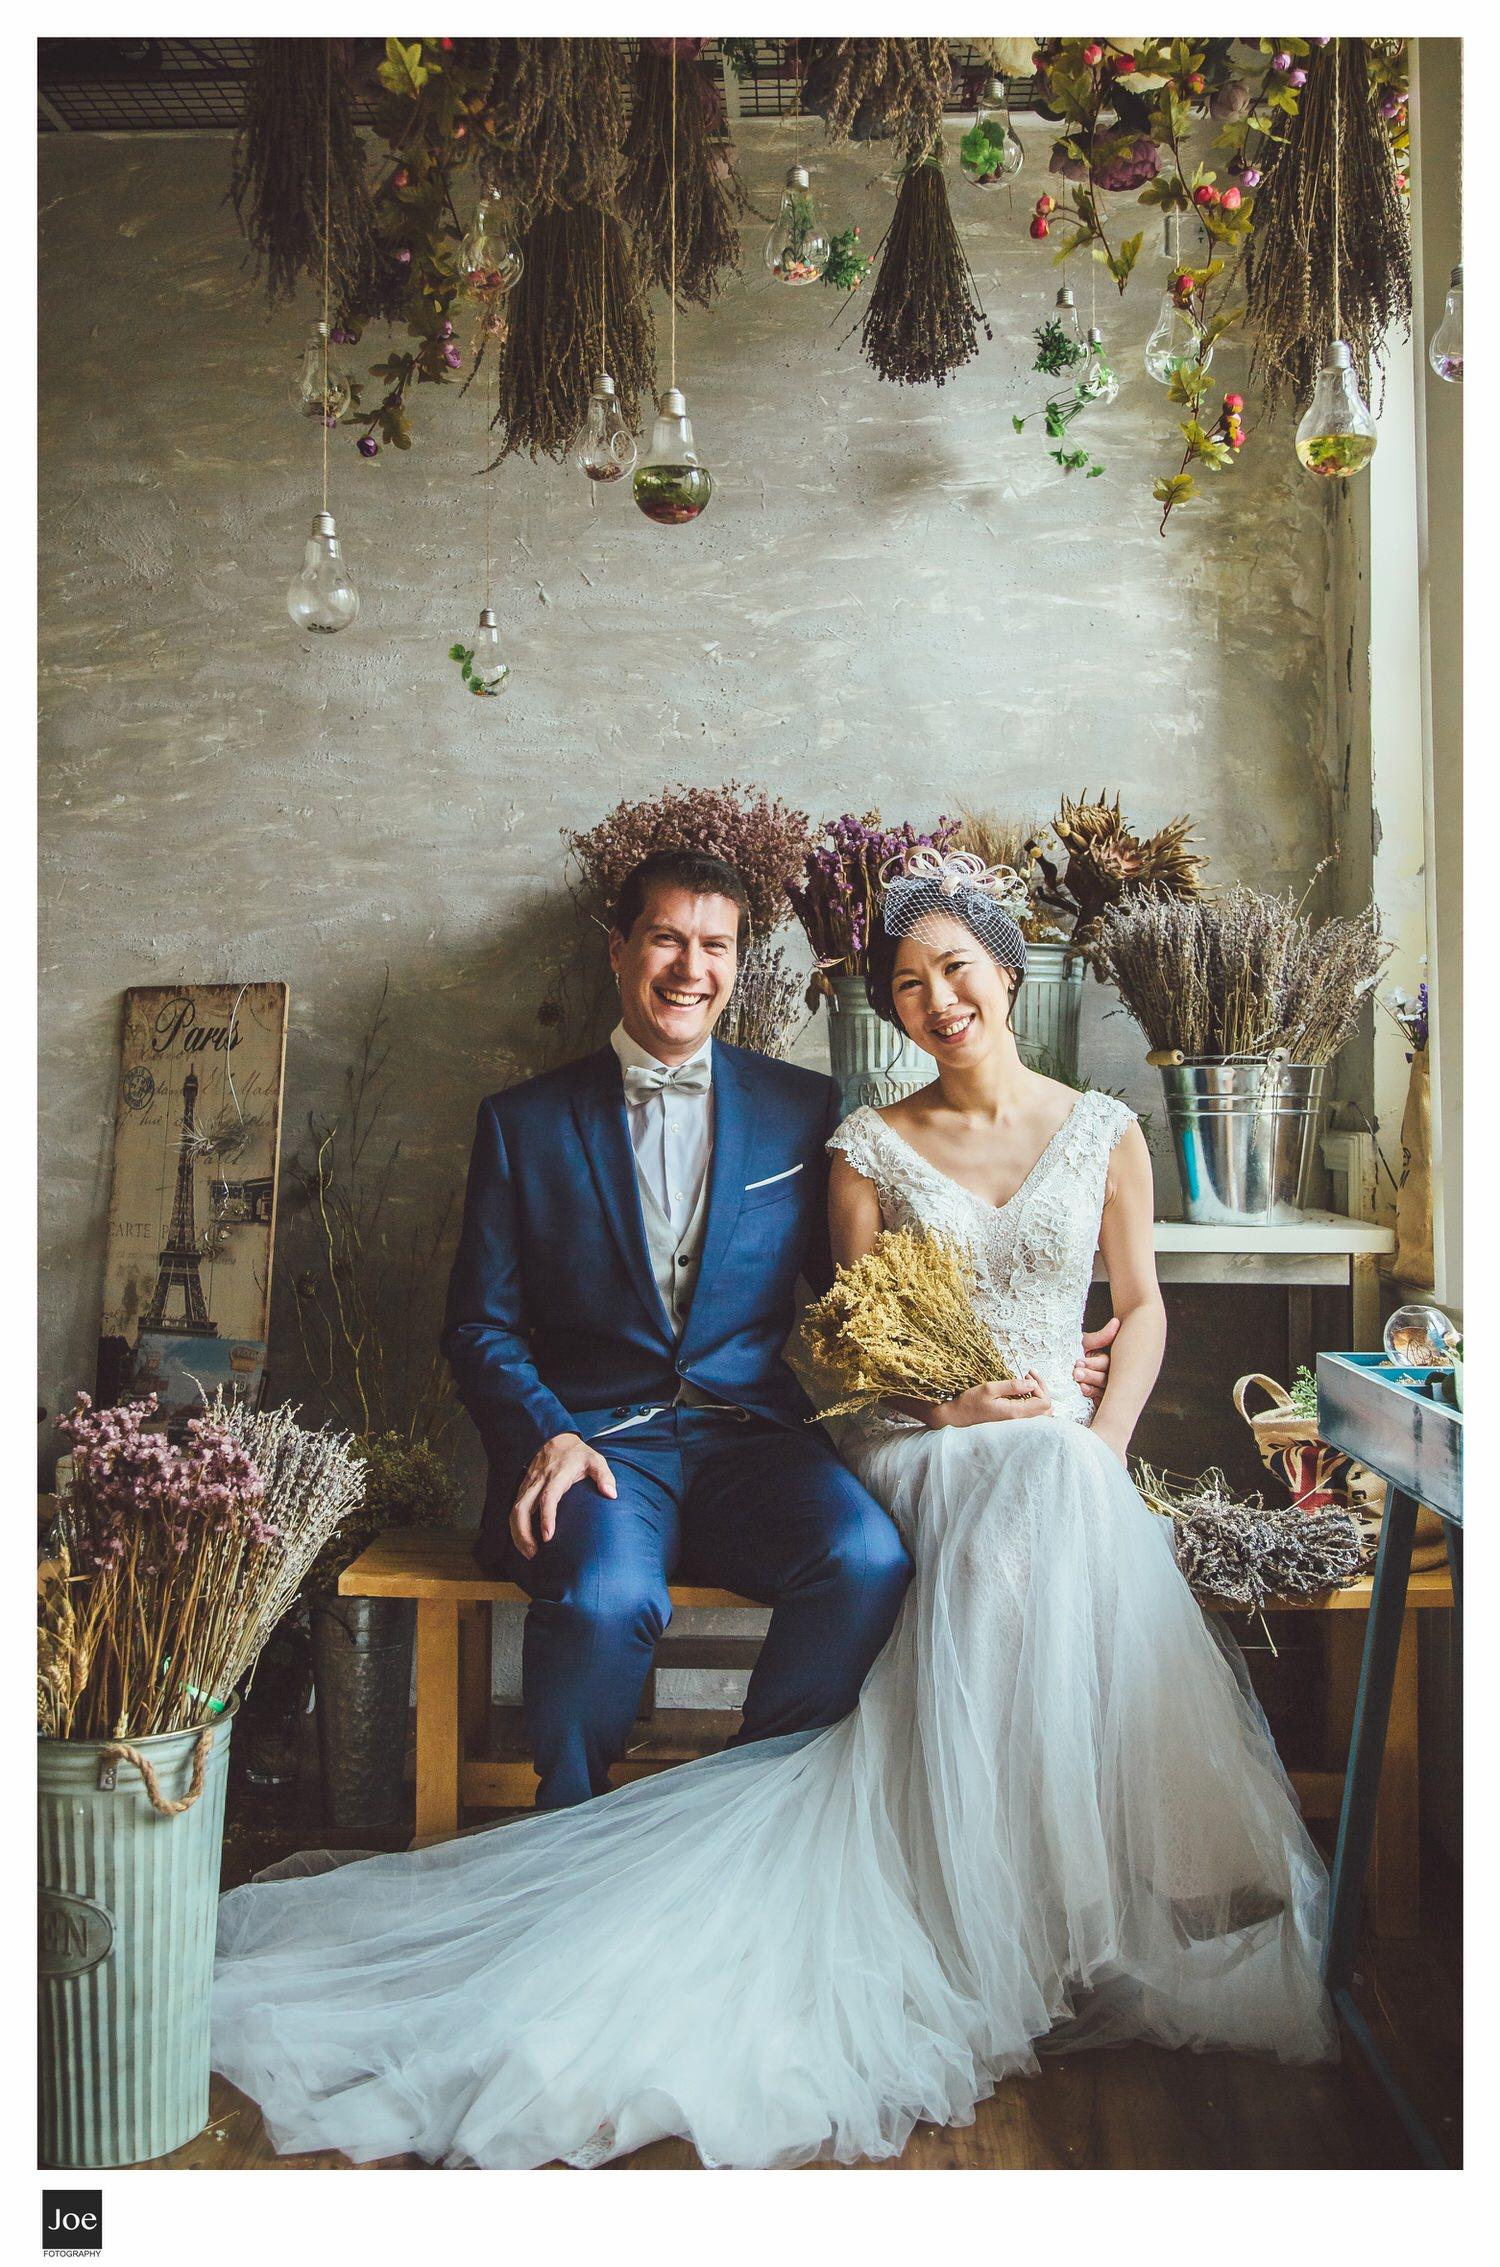 joe-fotography-pre-wedding-kay-jeff-001.jpg